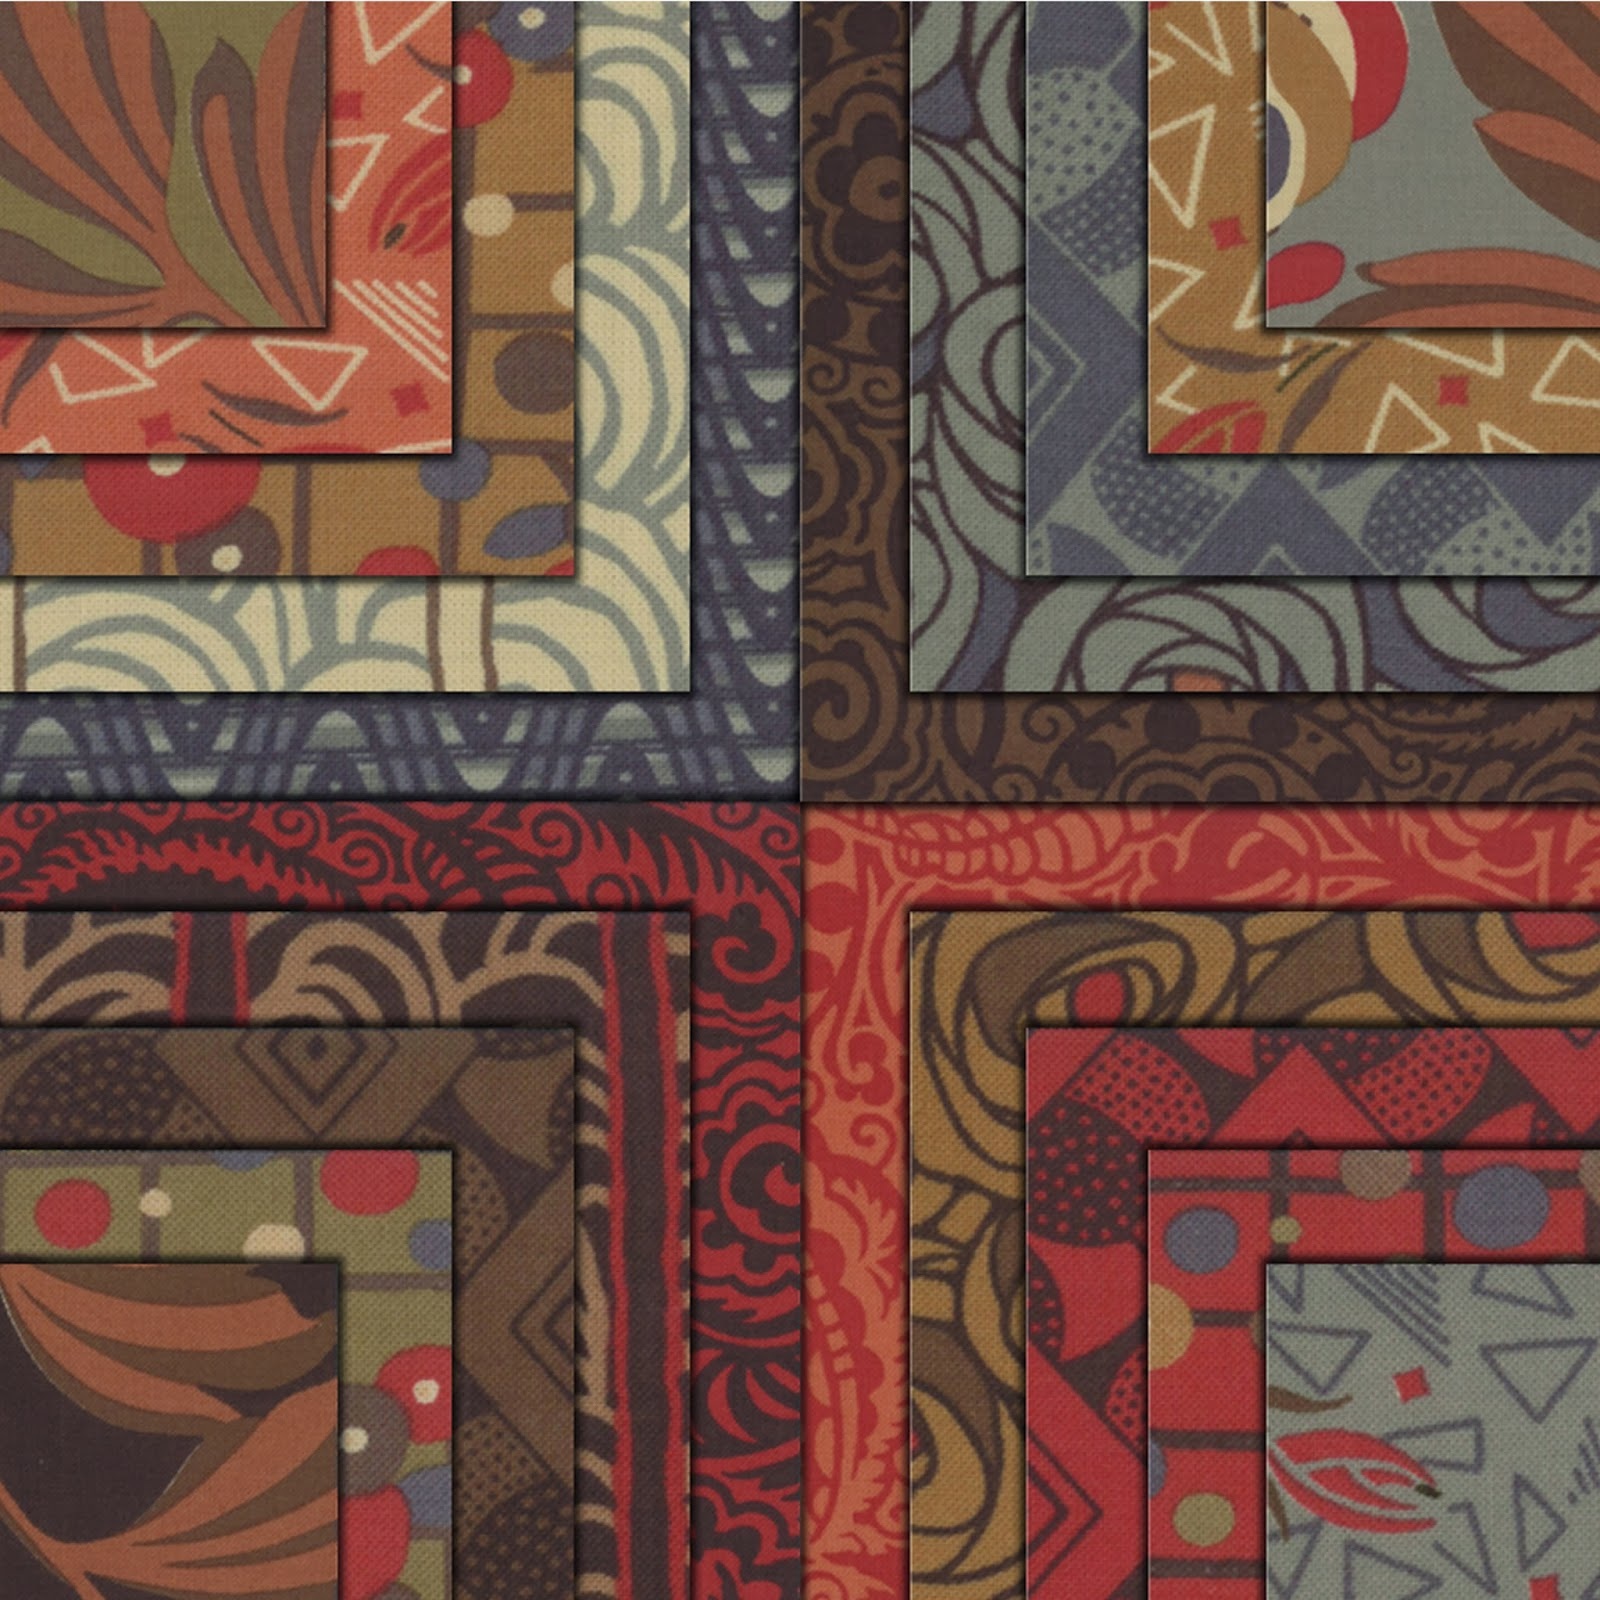 Moda MODERNISM Quilt Fabric by Barbara Brackman